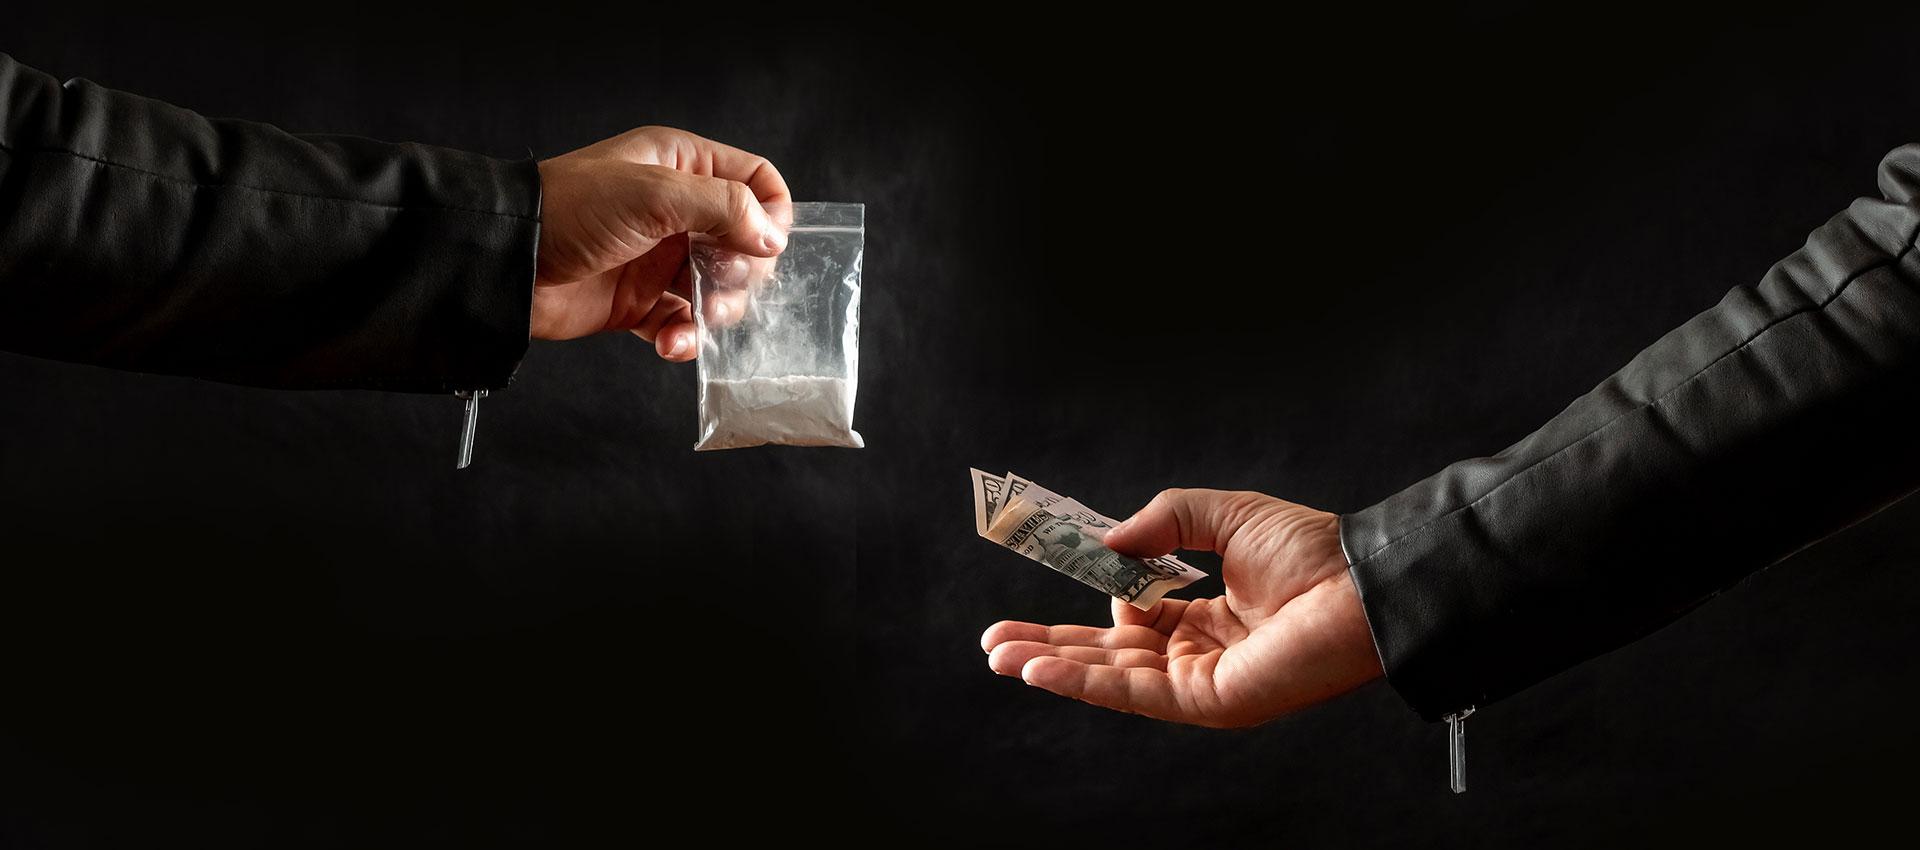 Drugs, Theft, Probation Violations